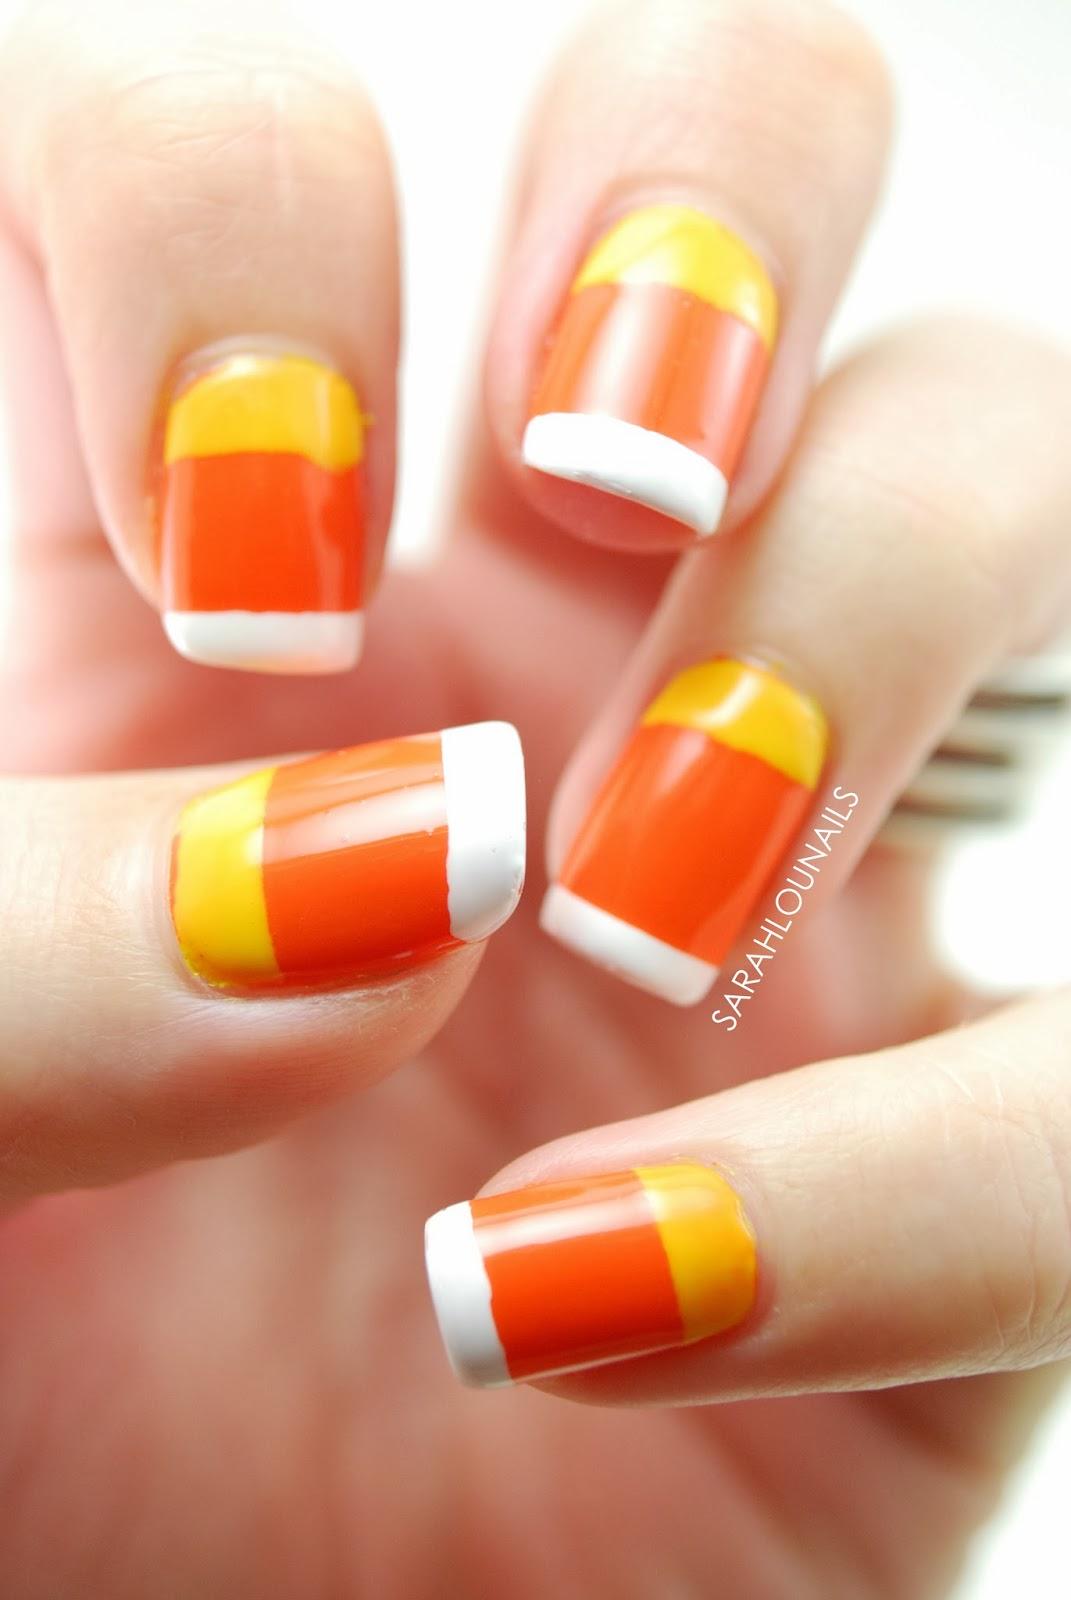 Sarah lou nails candy corn nails candy corn nails prinsesfo Image collections